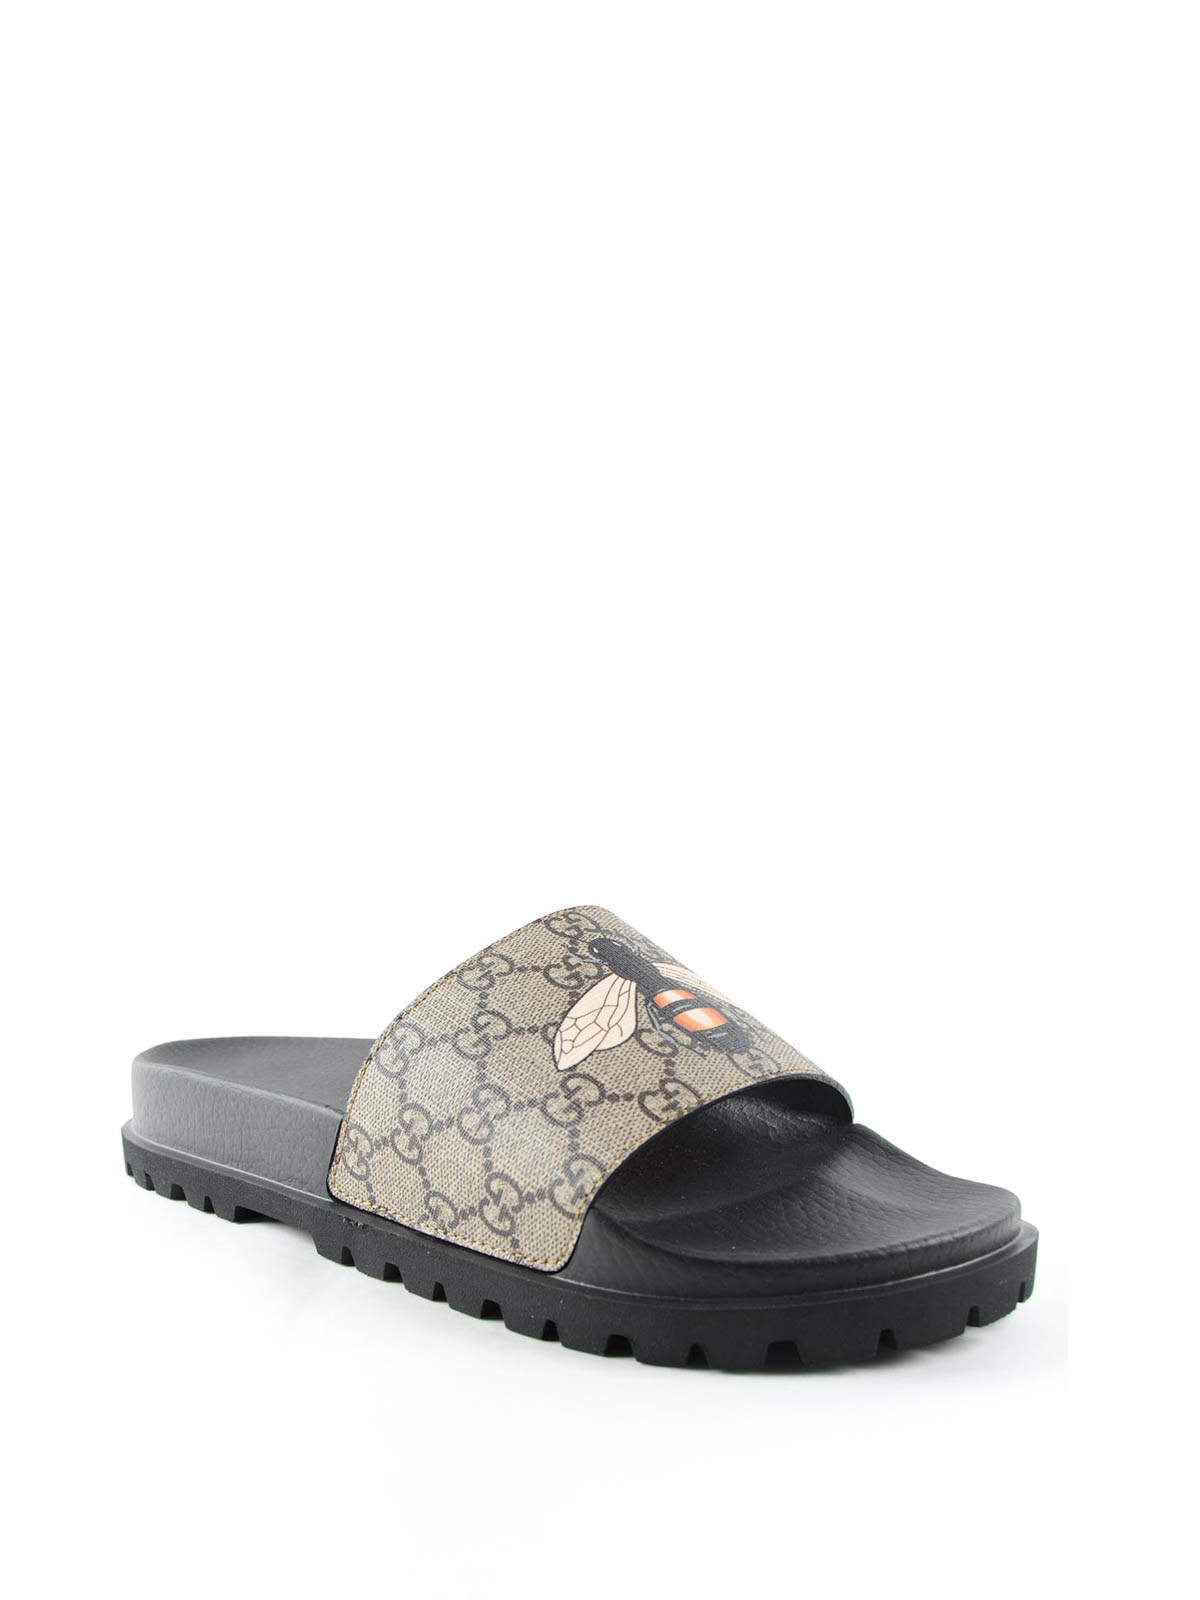 Bee Flat Sandals By Gucci - Sandals  Ikrix-4300